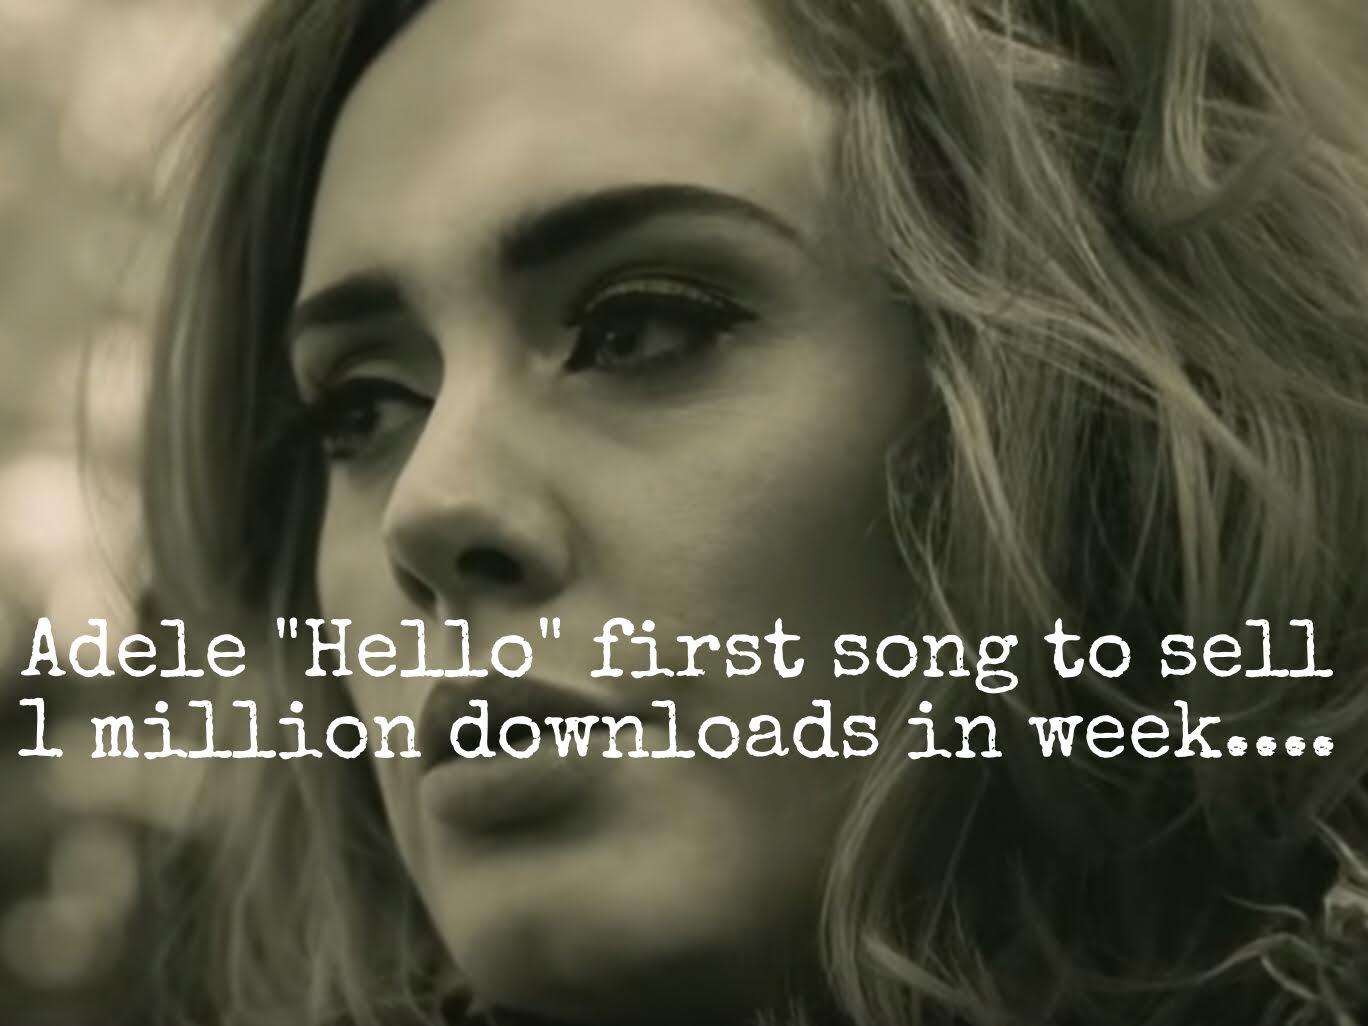 Adele - Kings of A&R